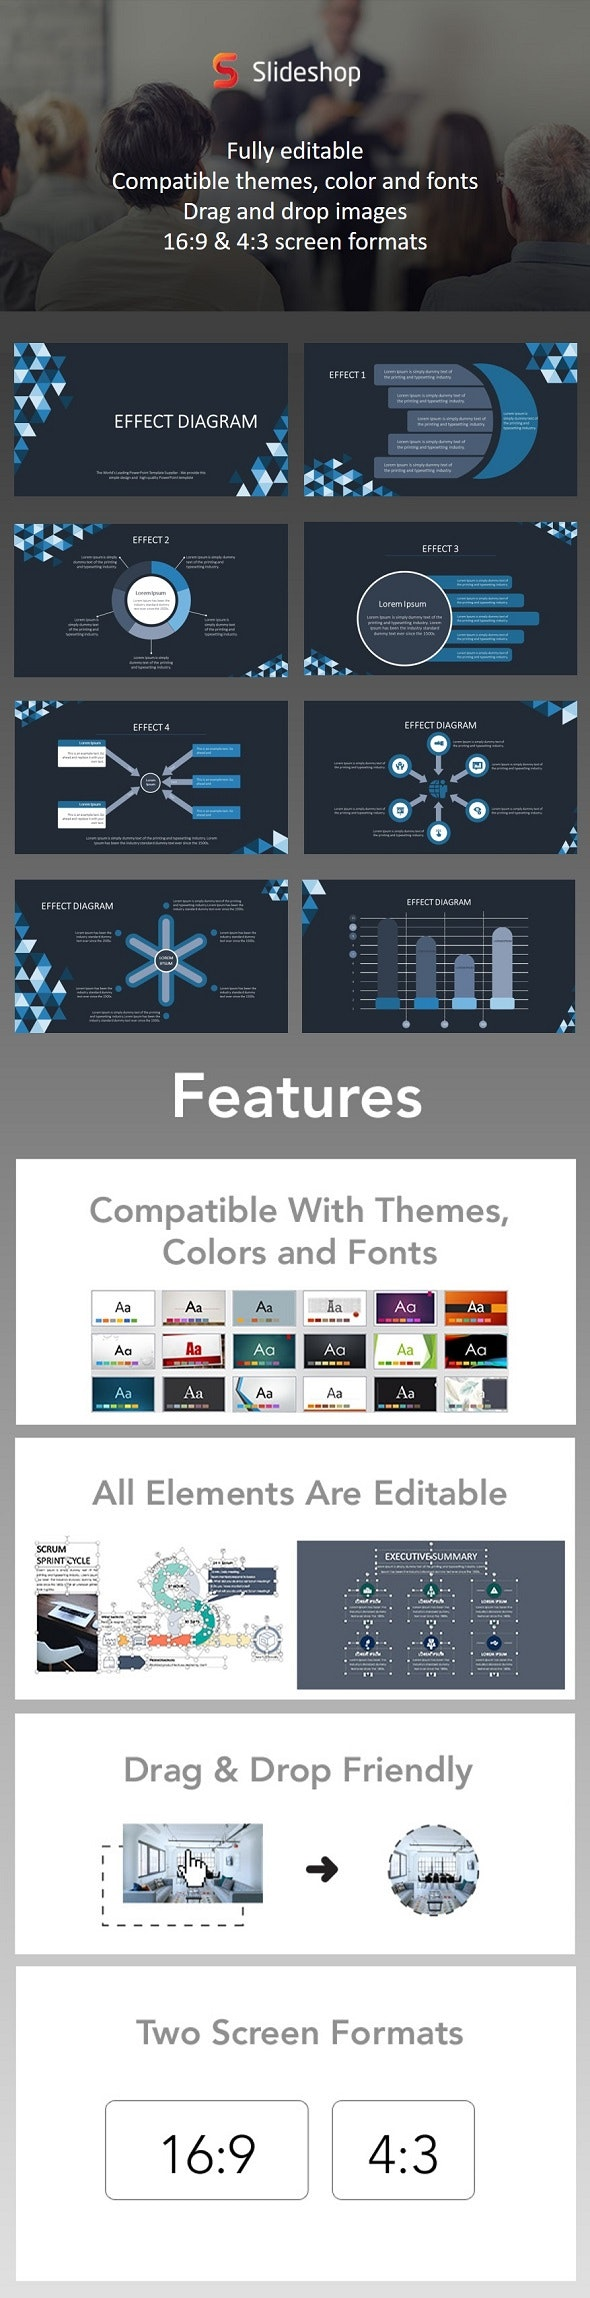 Effect Diagram Animation Blue - PowerPoint Templates Presentation Templates